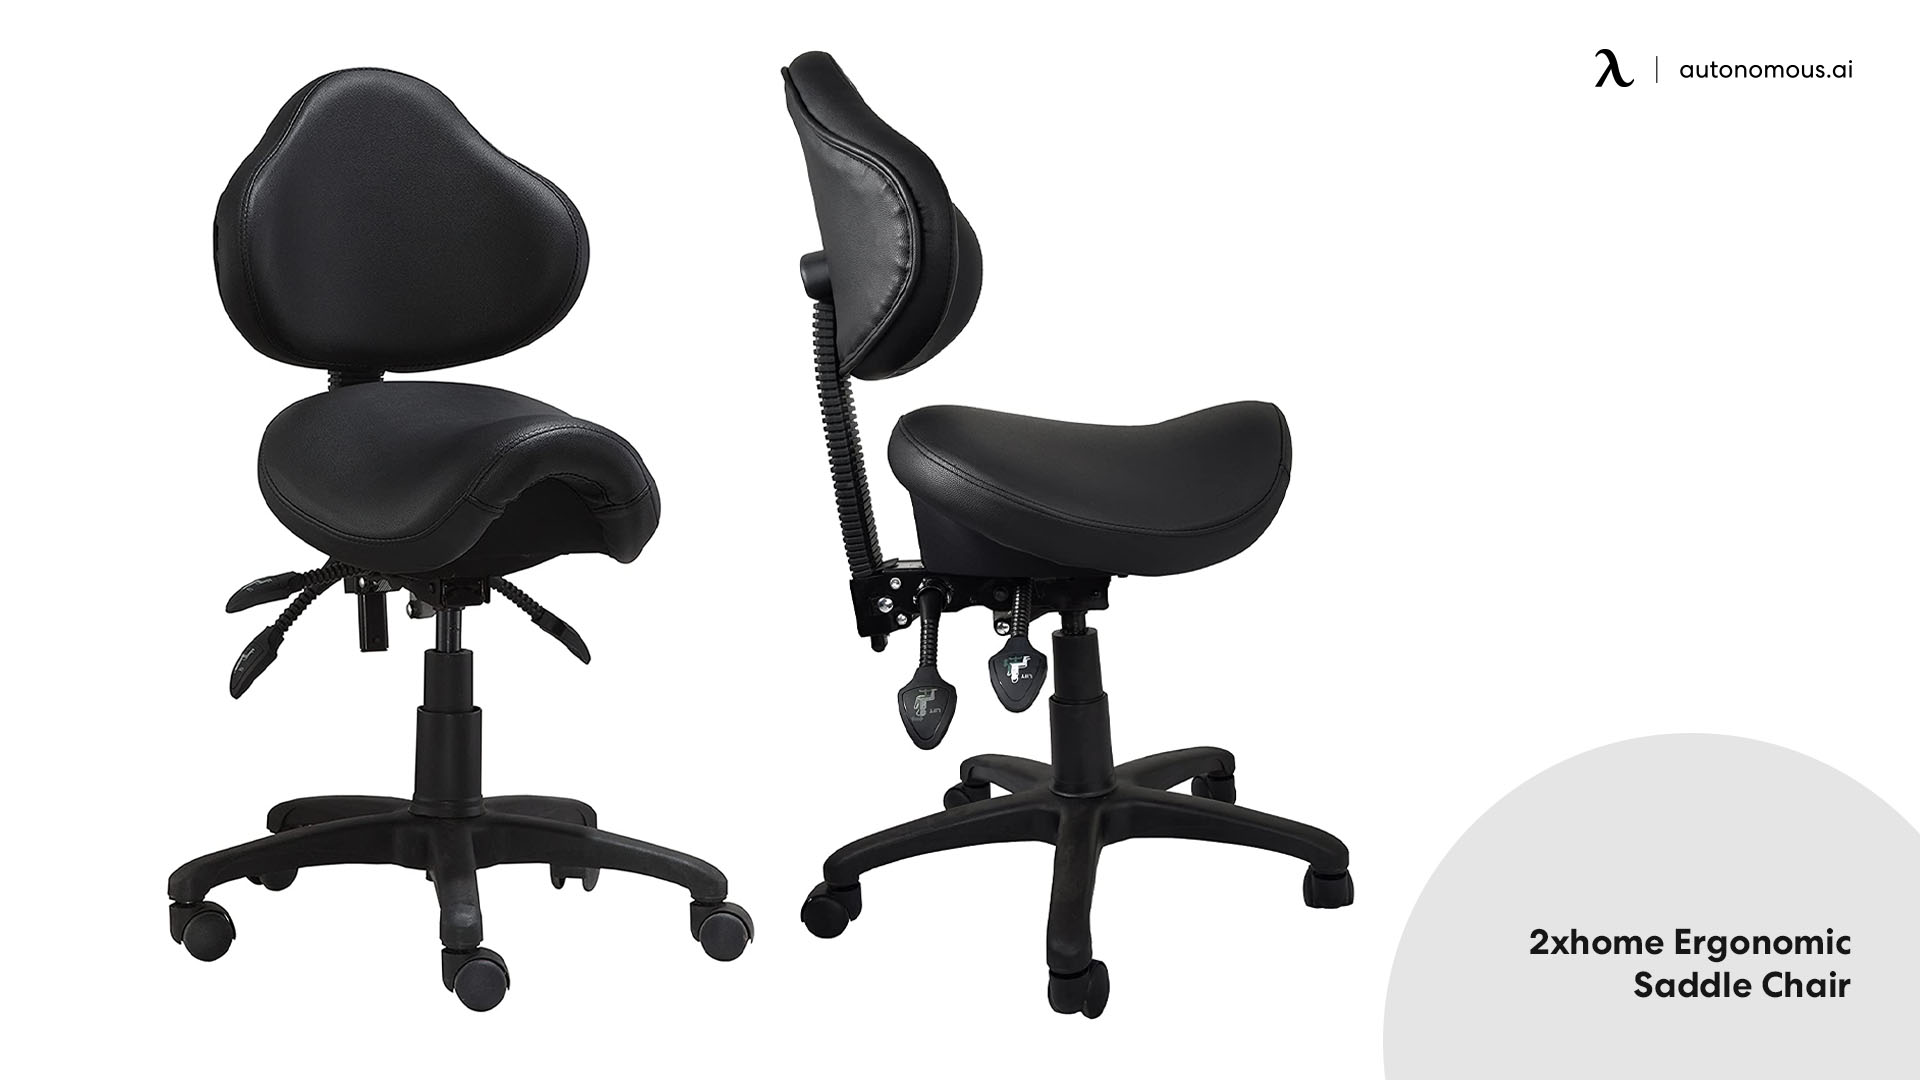 2xhome Ergonomic Saddle Chair